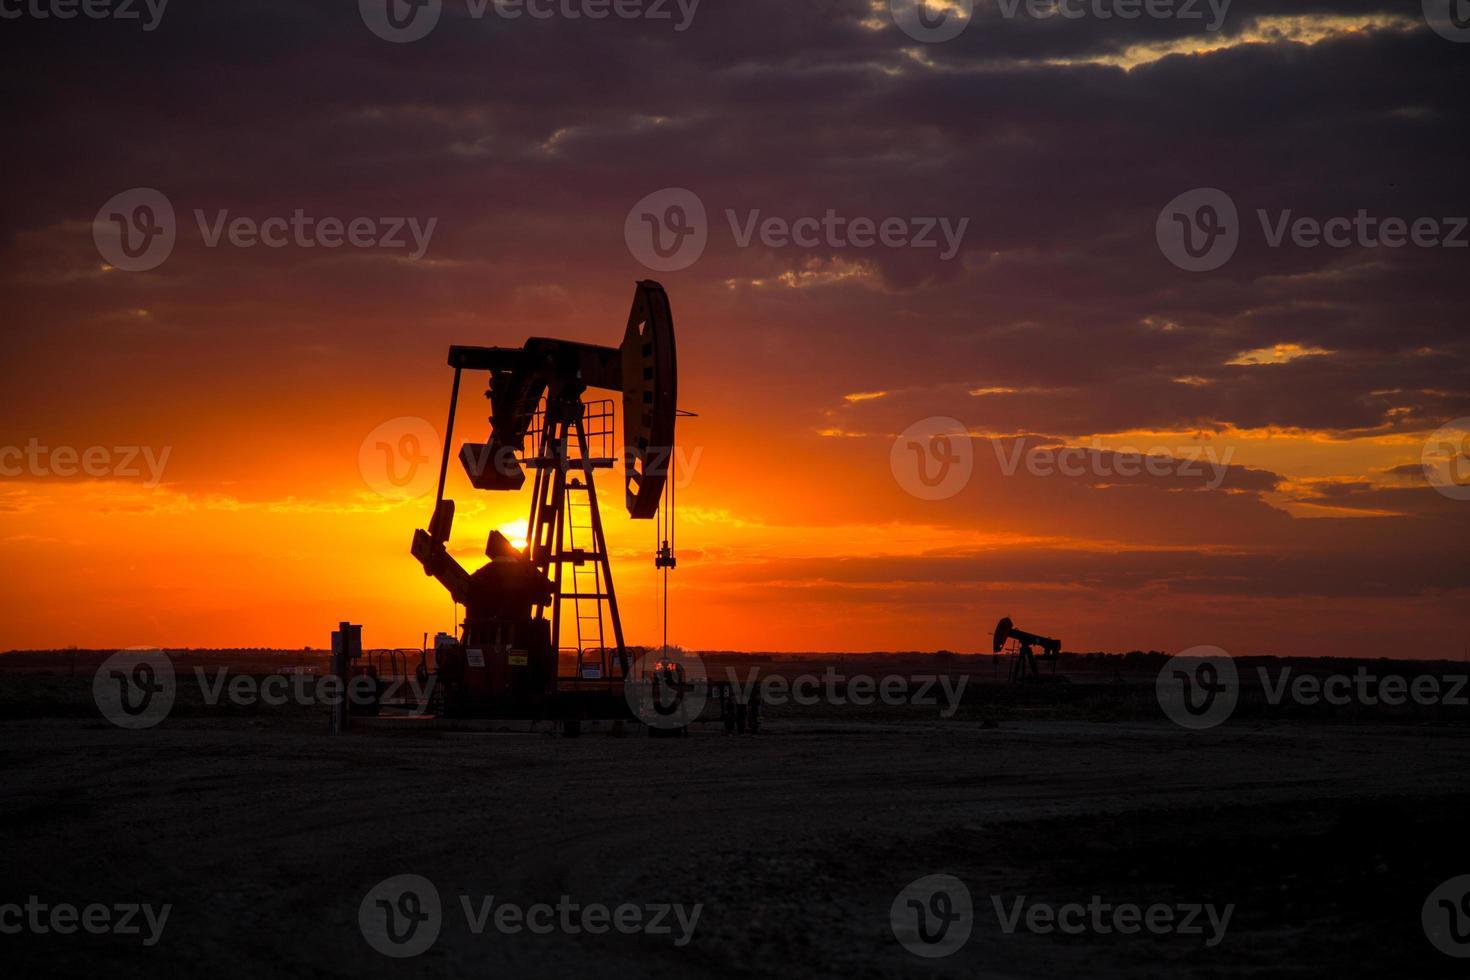 olieveld pumpjacks bij zonsondergang foto